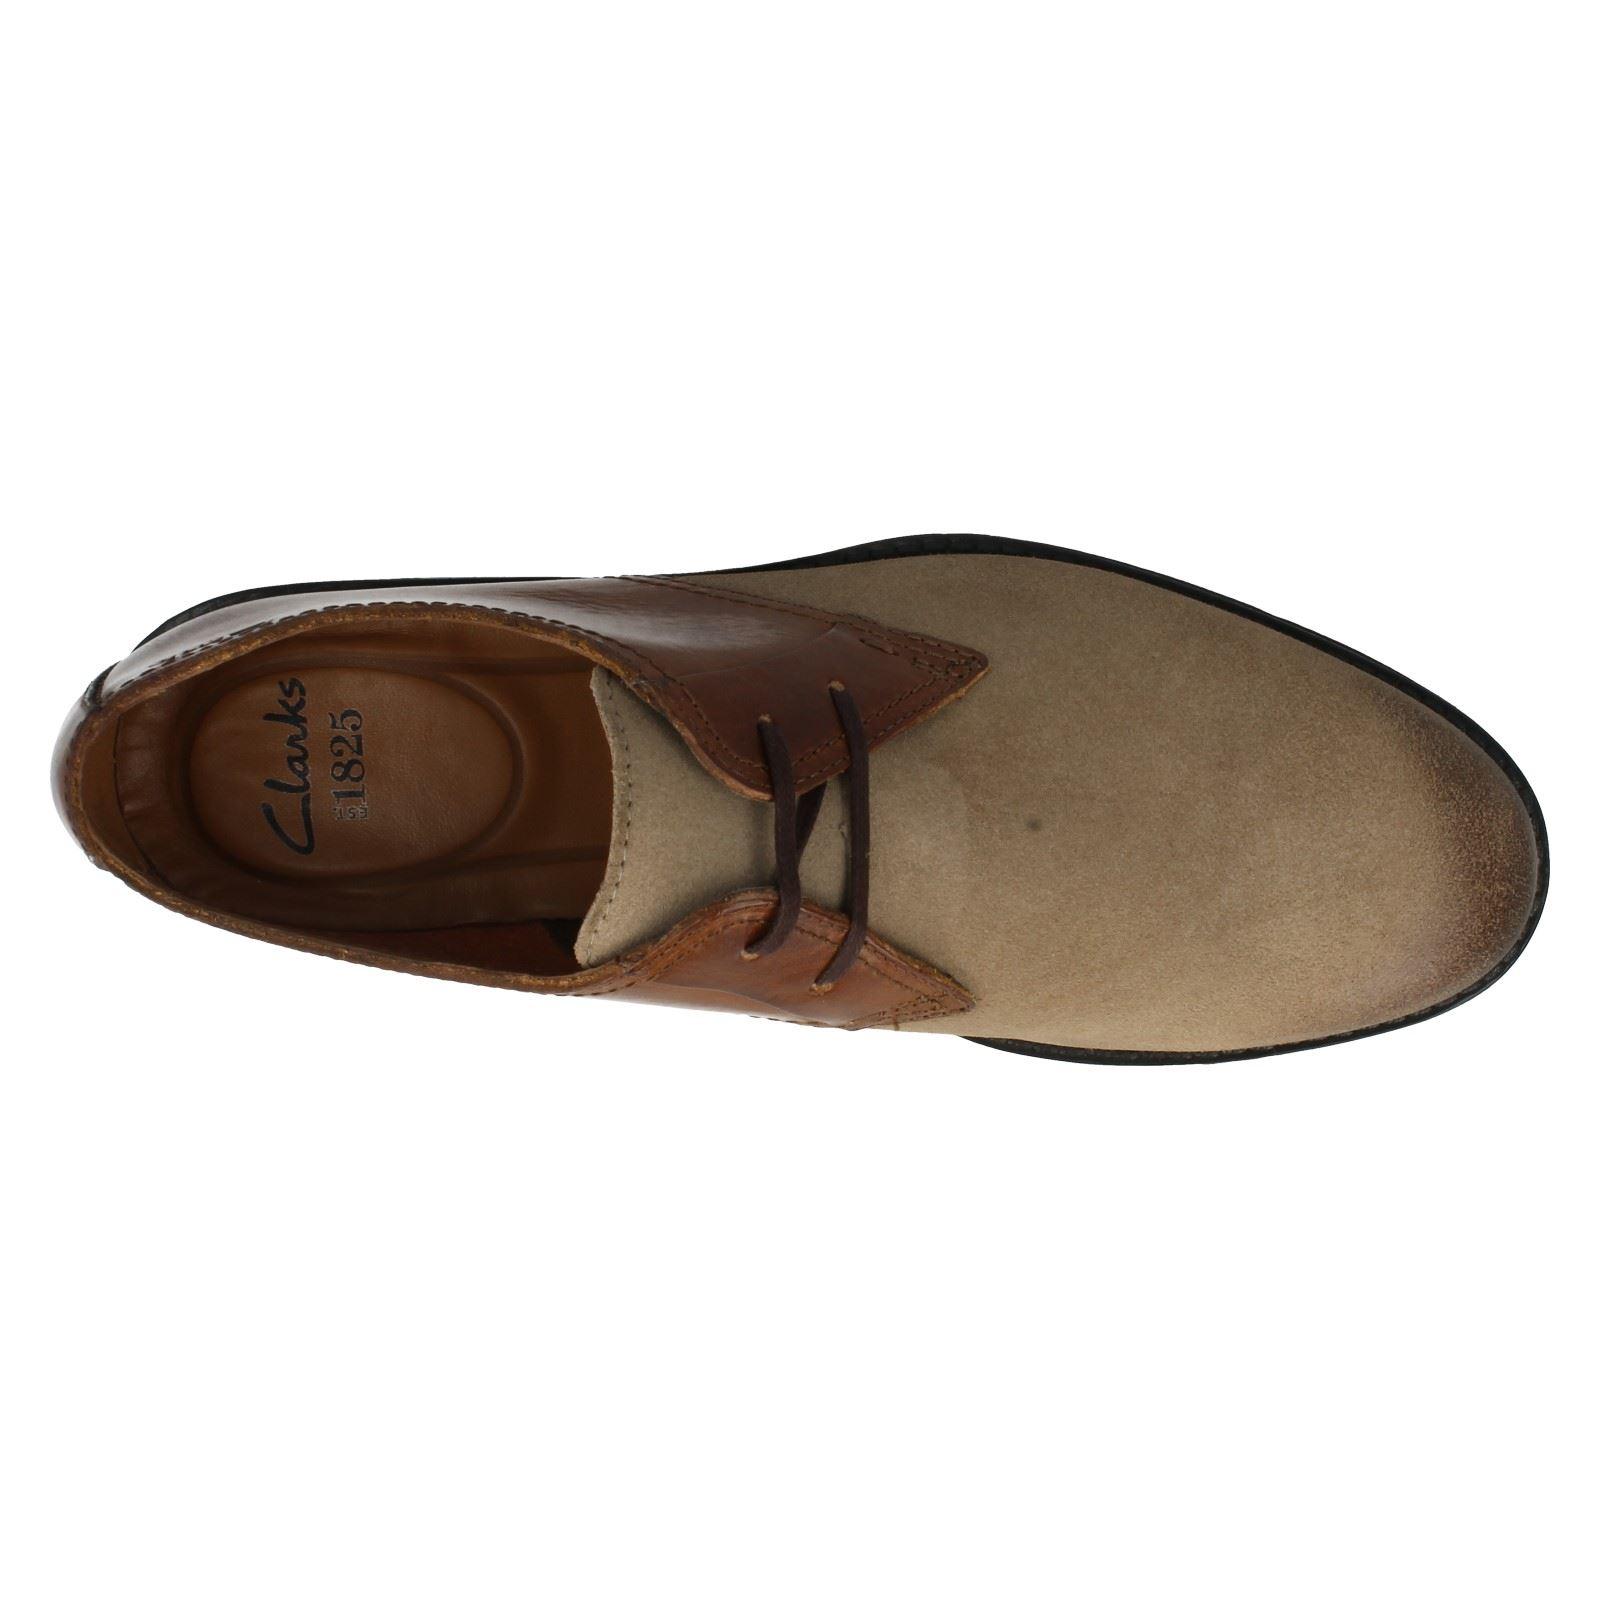 Men's Clarks Shoes Casual Shoes Clarks Label - Hawkley Walk bc9405